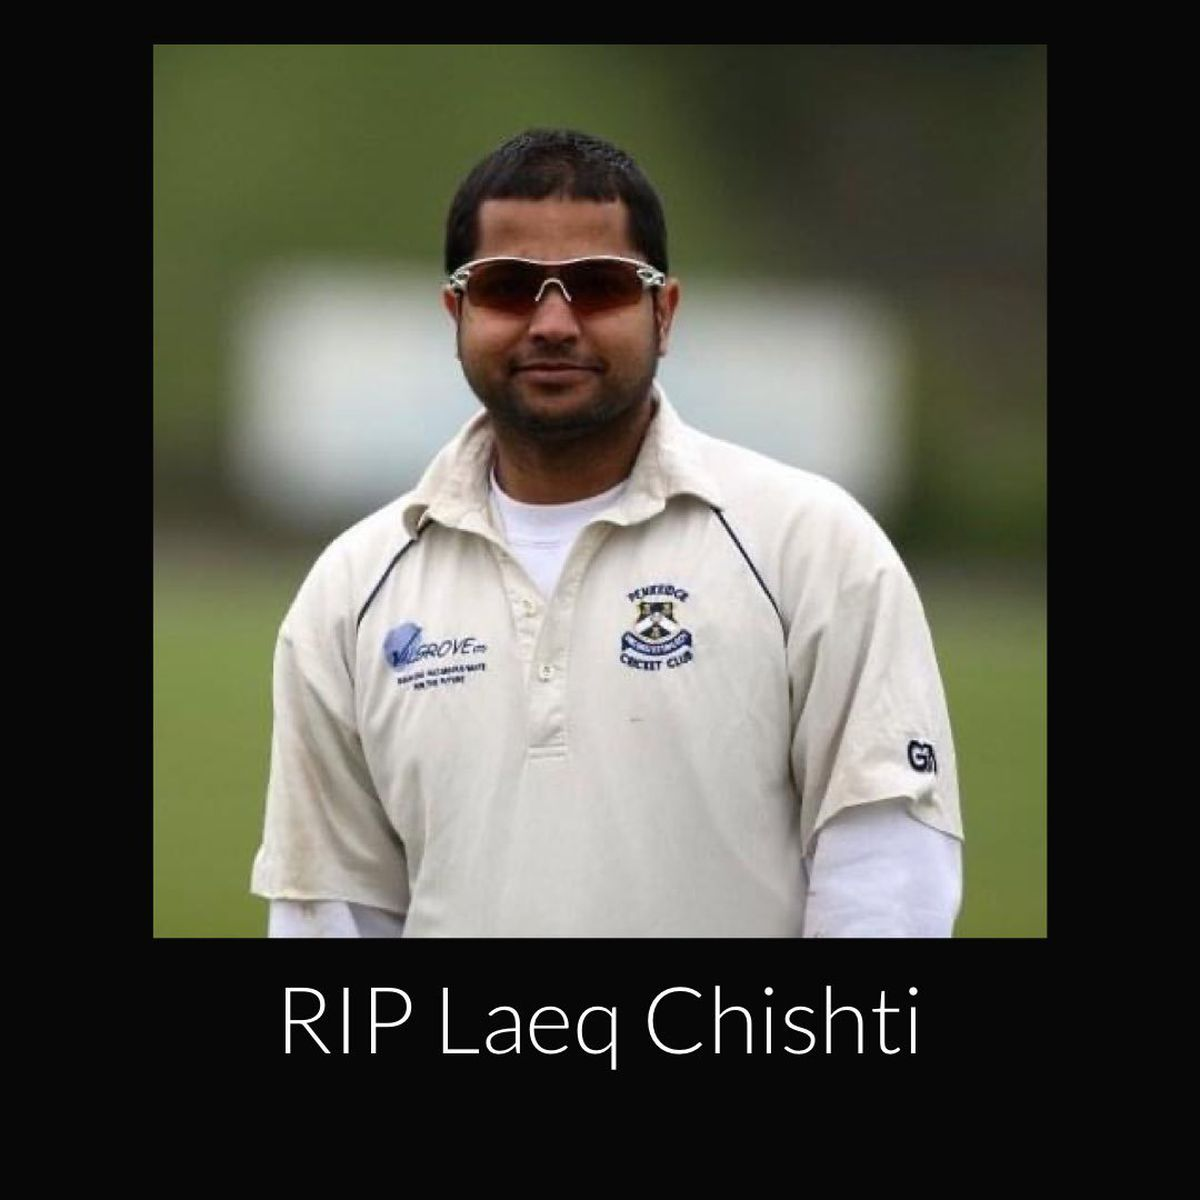 Laeq Chishti was aged 37